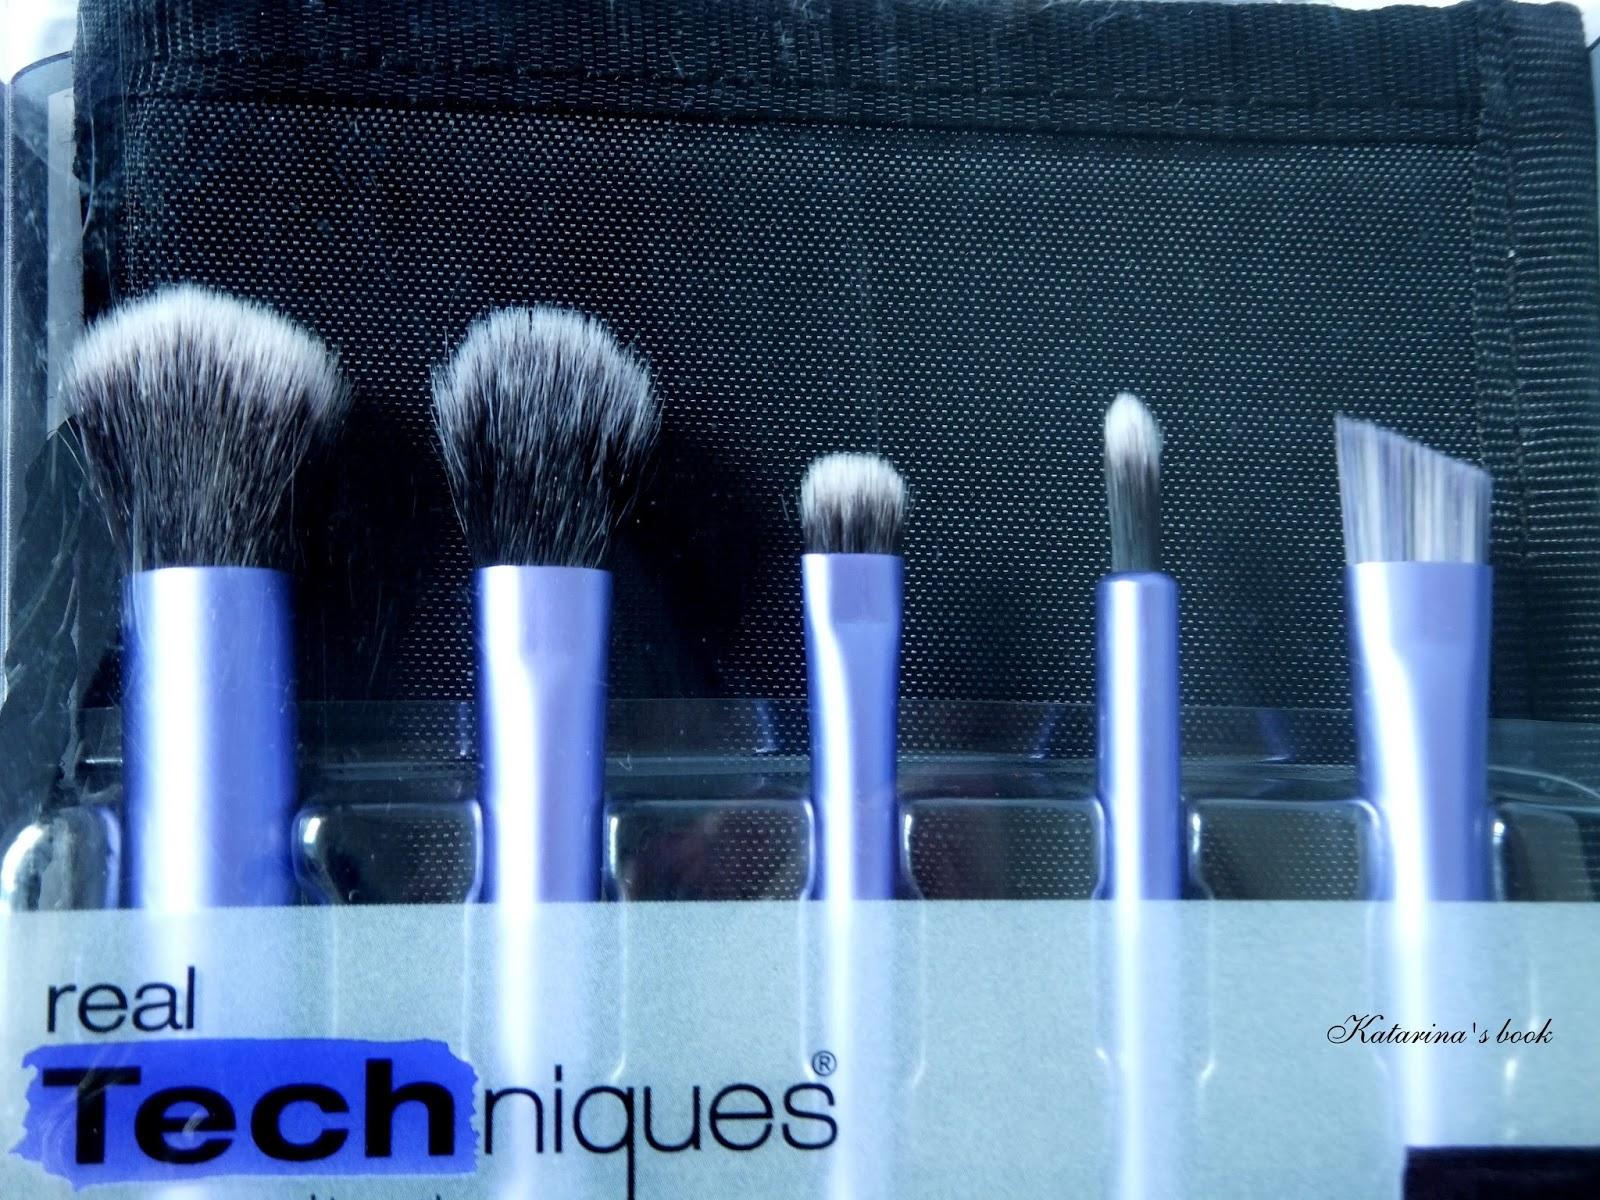 кисти для макияжа, кисти, реал техникс, риал техникс